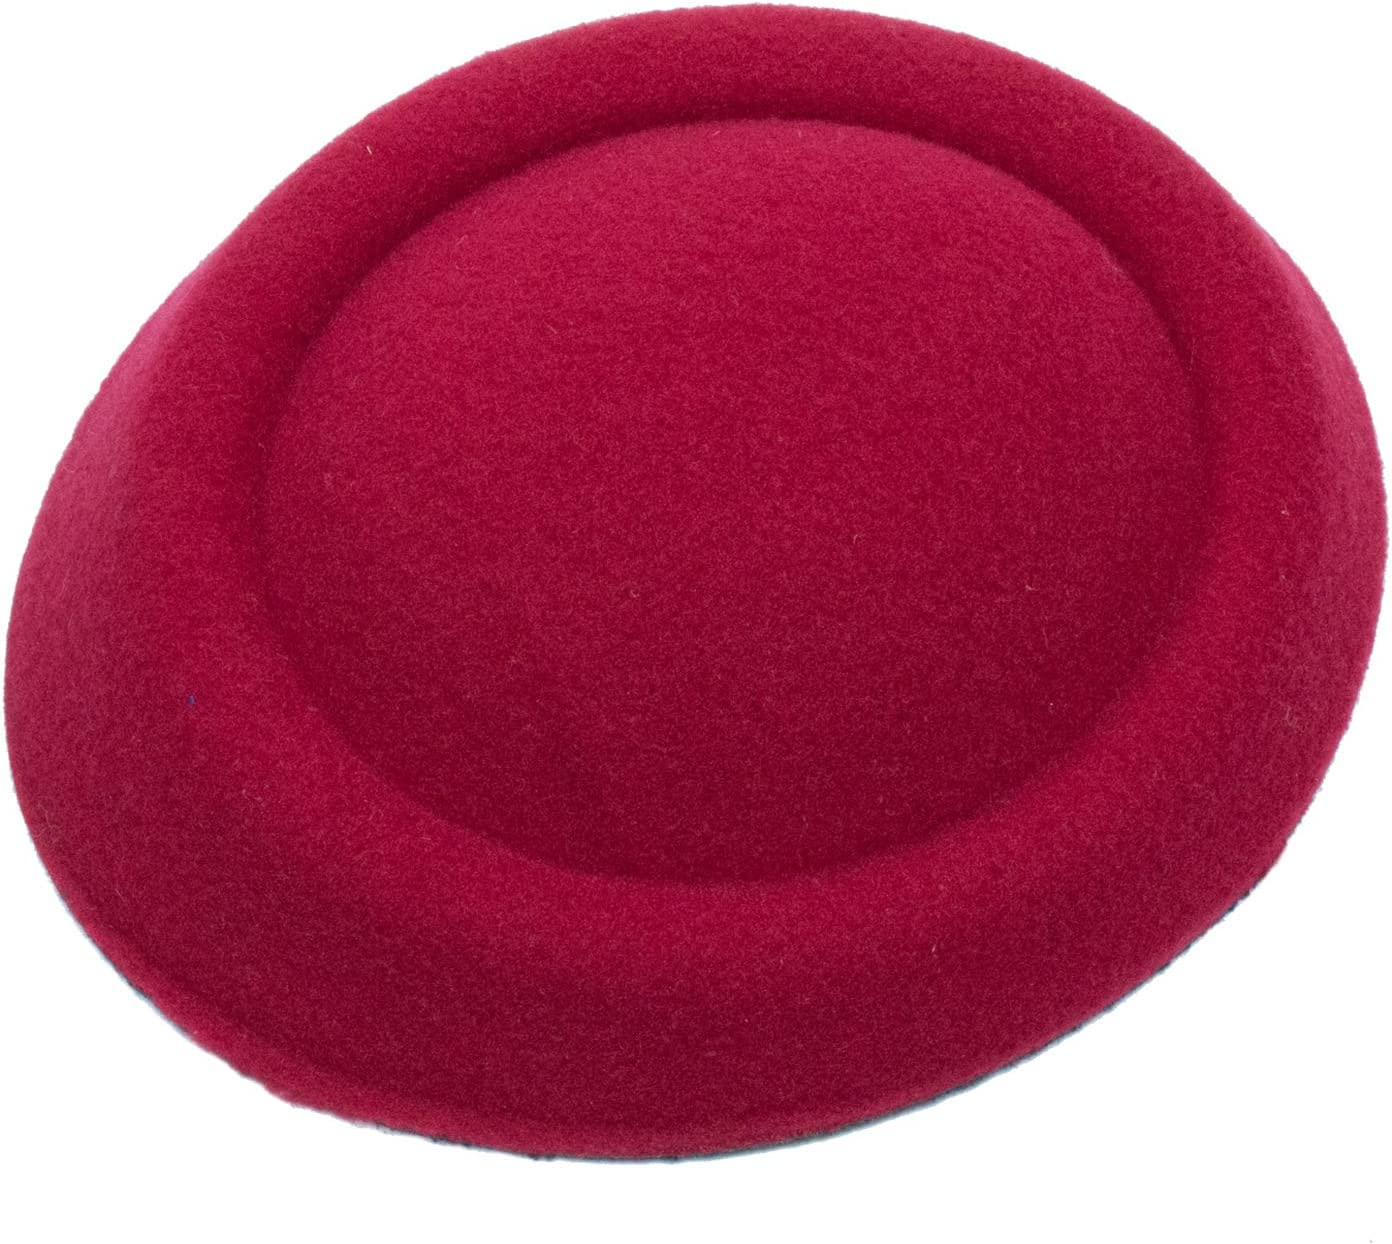 Oval Pillbox Stewardess Fascinator Hat Base 5